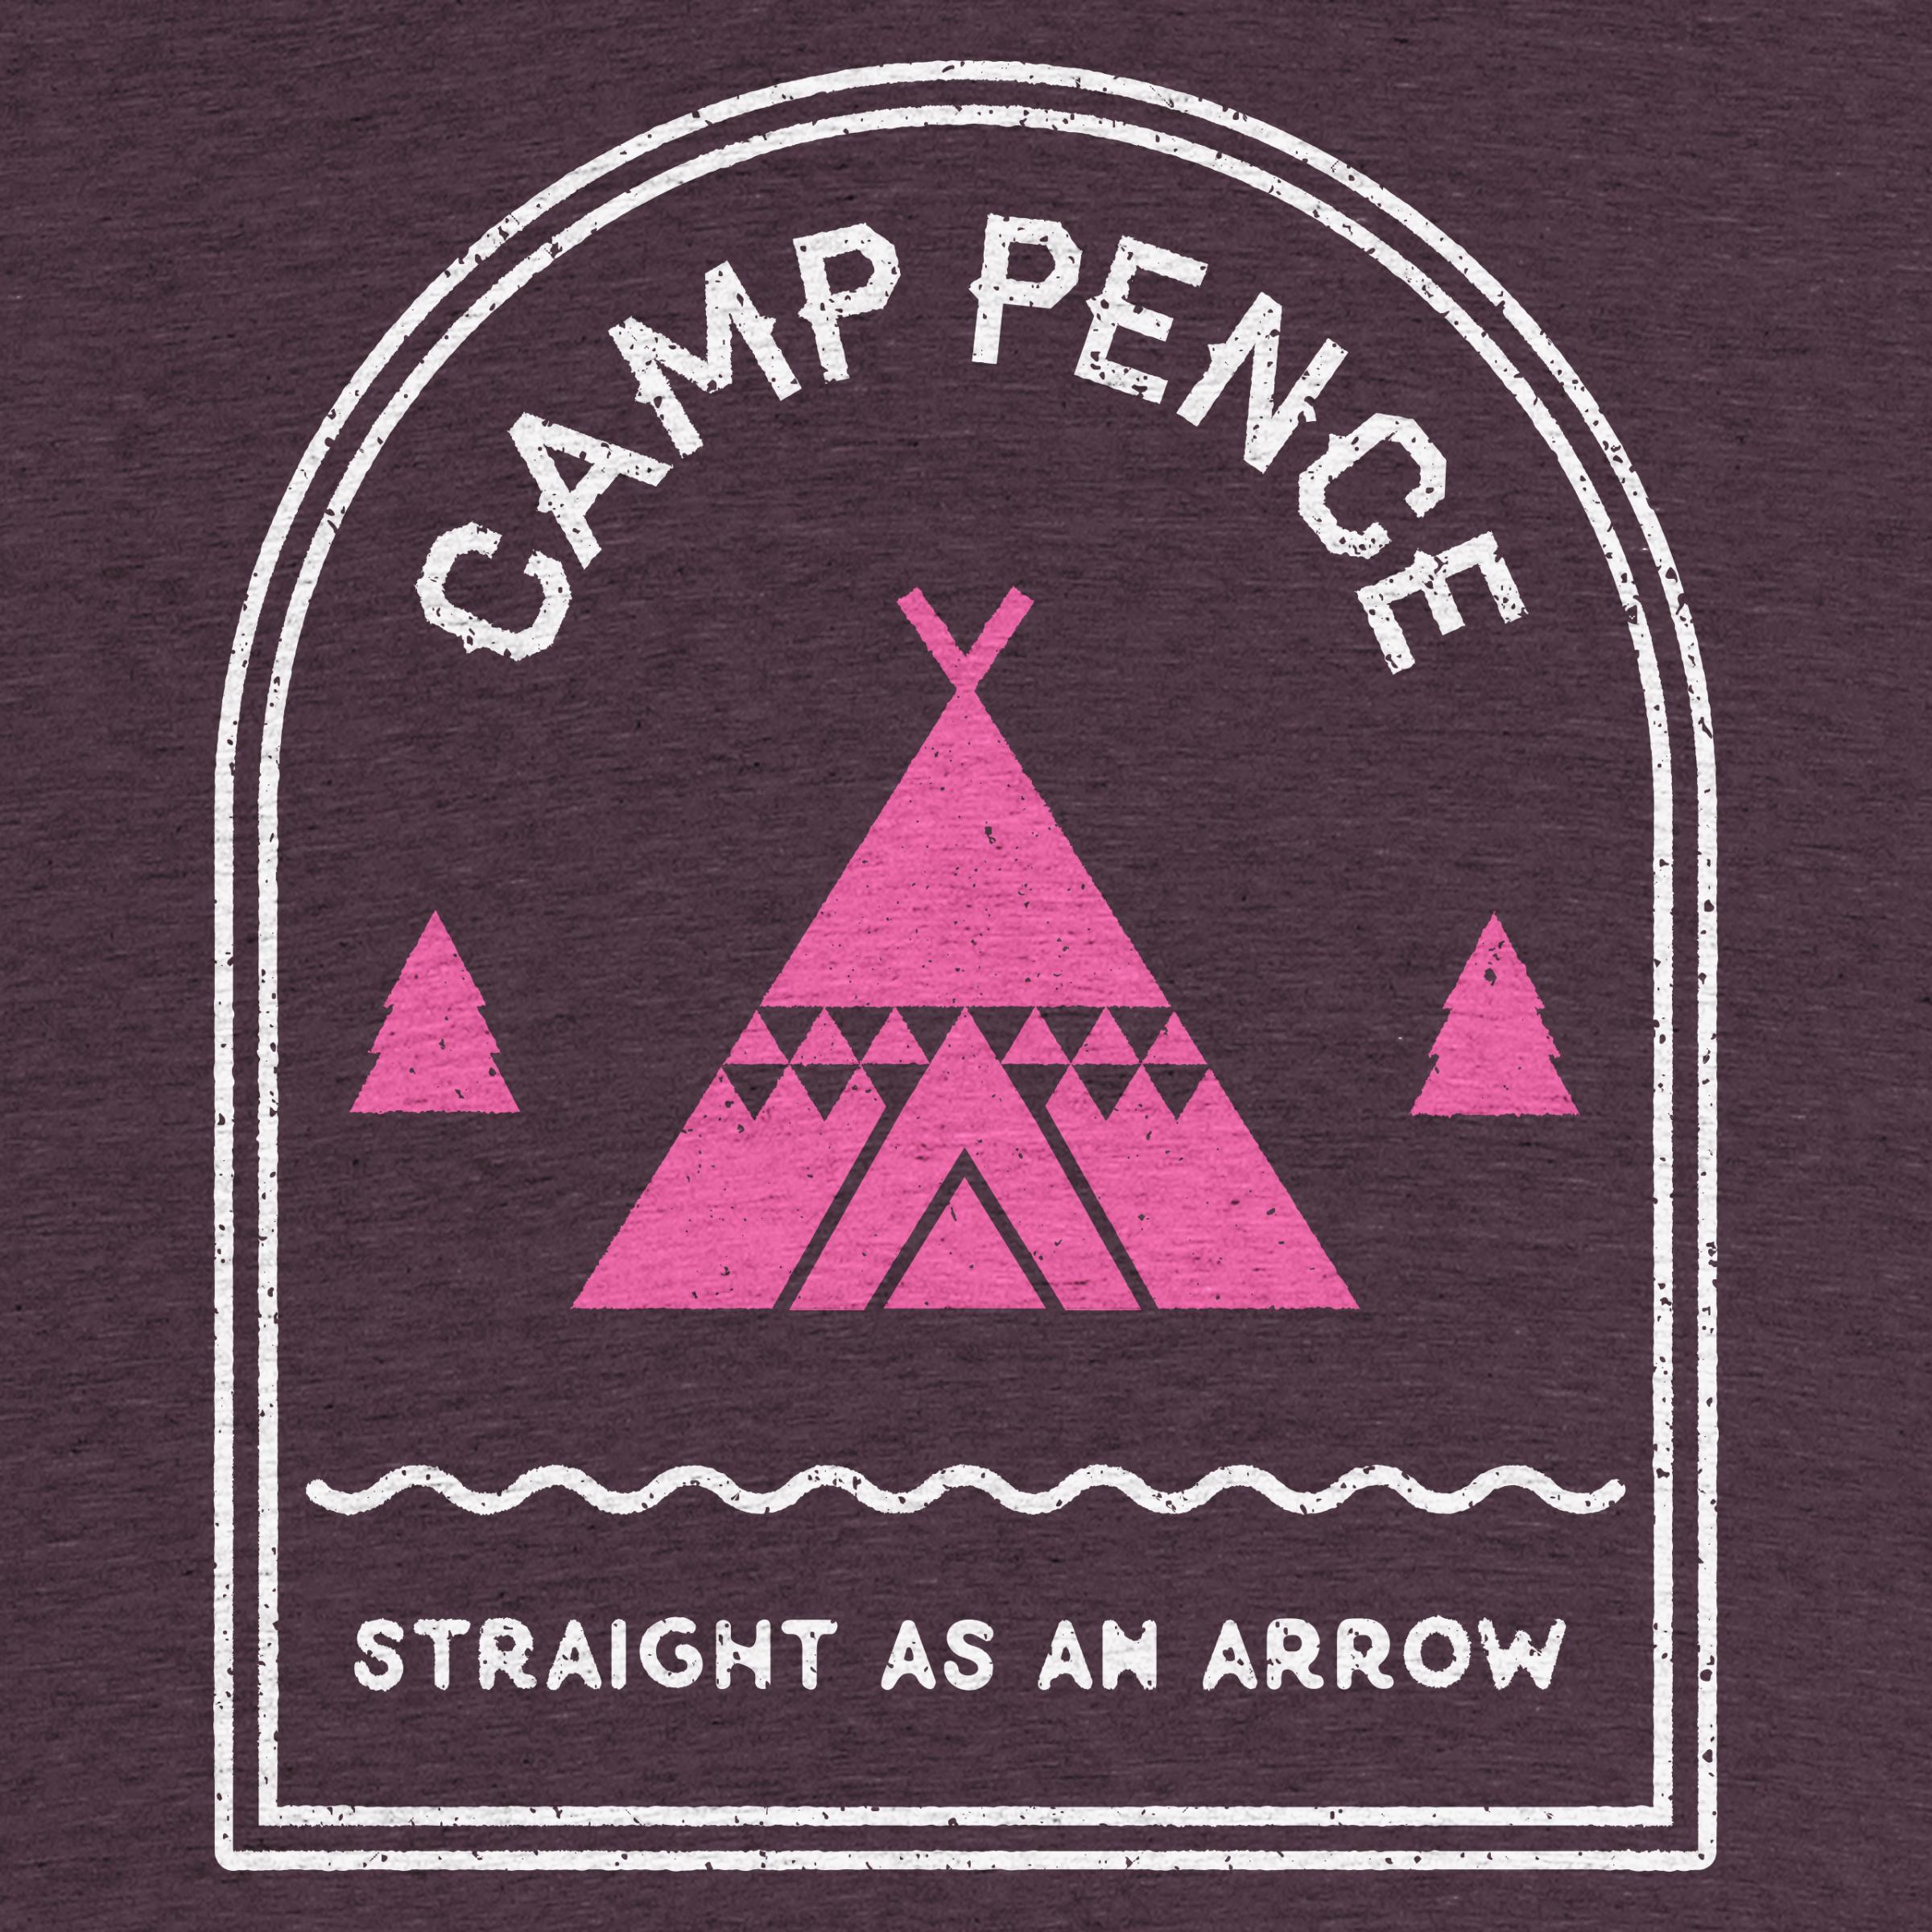 Camp Pence